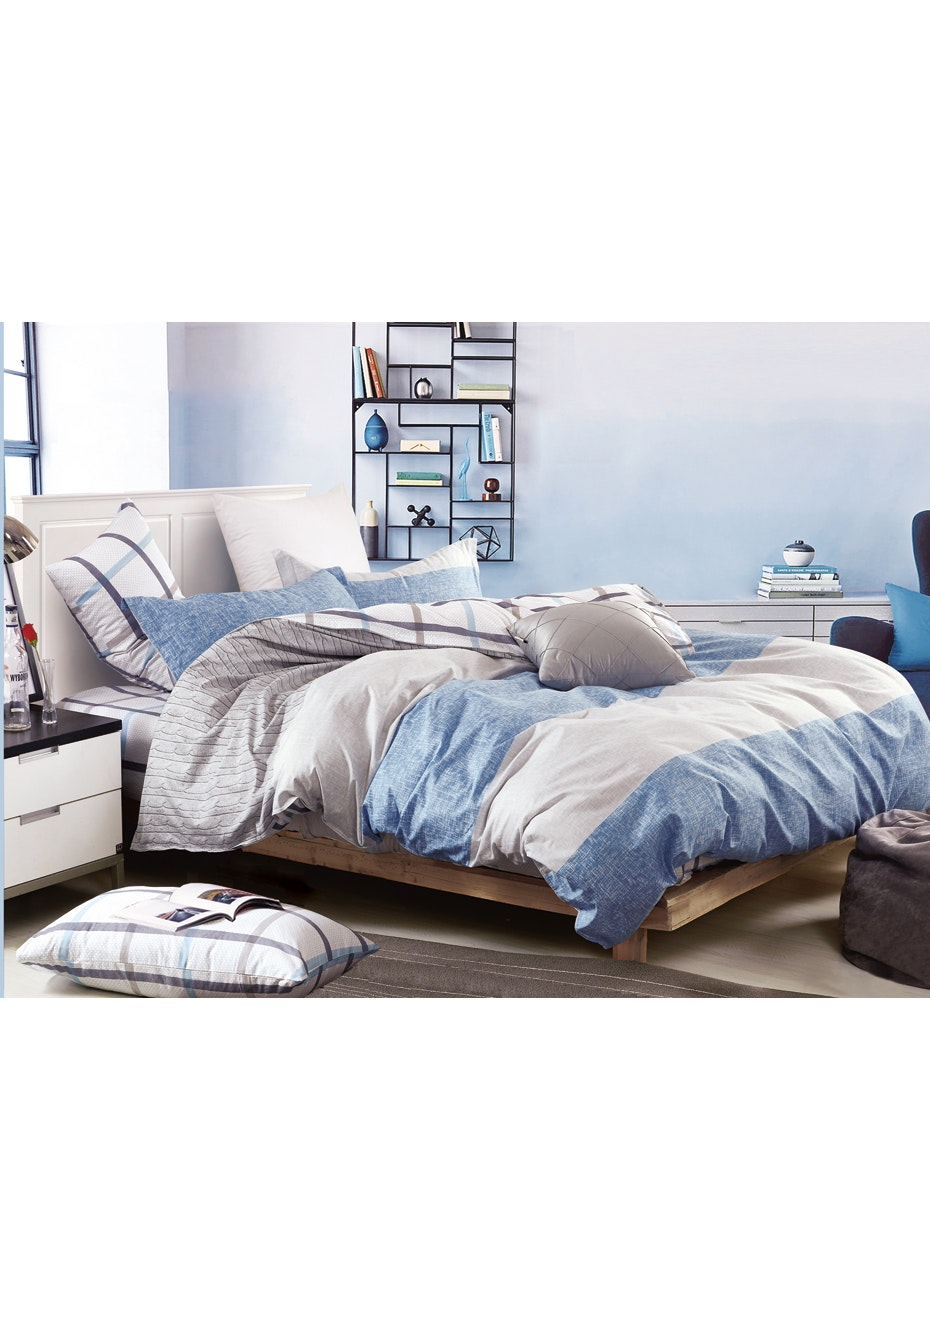 Cable Beach Quilt Cover Set - Reversible Design - 100% Cotton - Single Bed